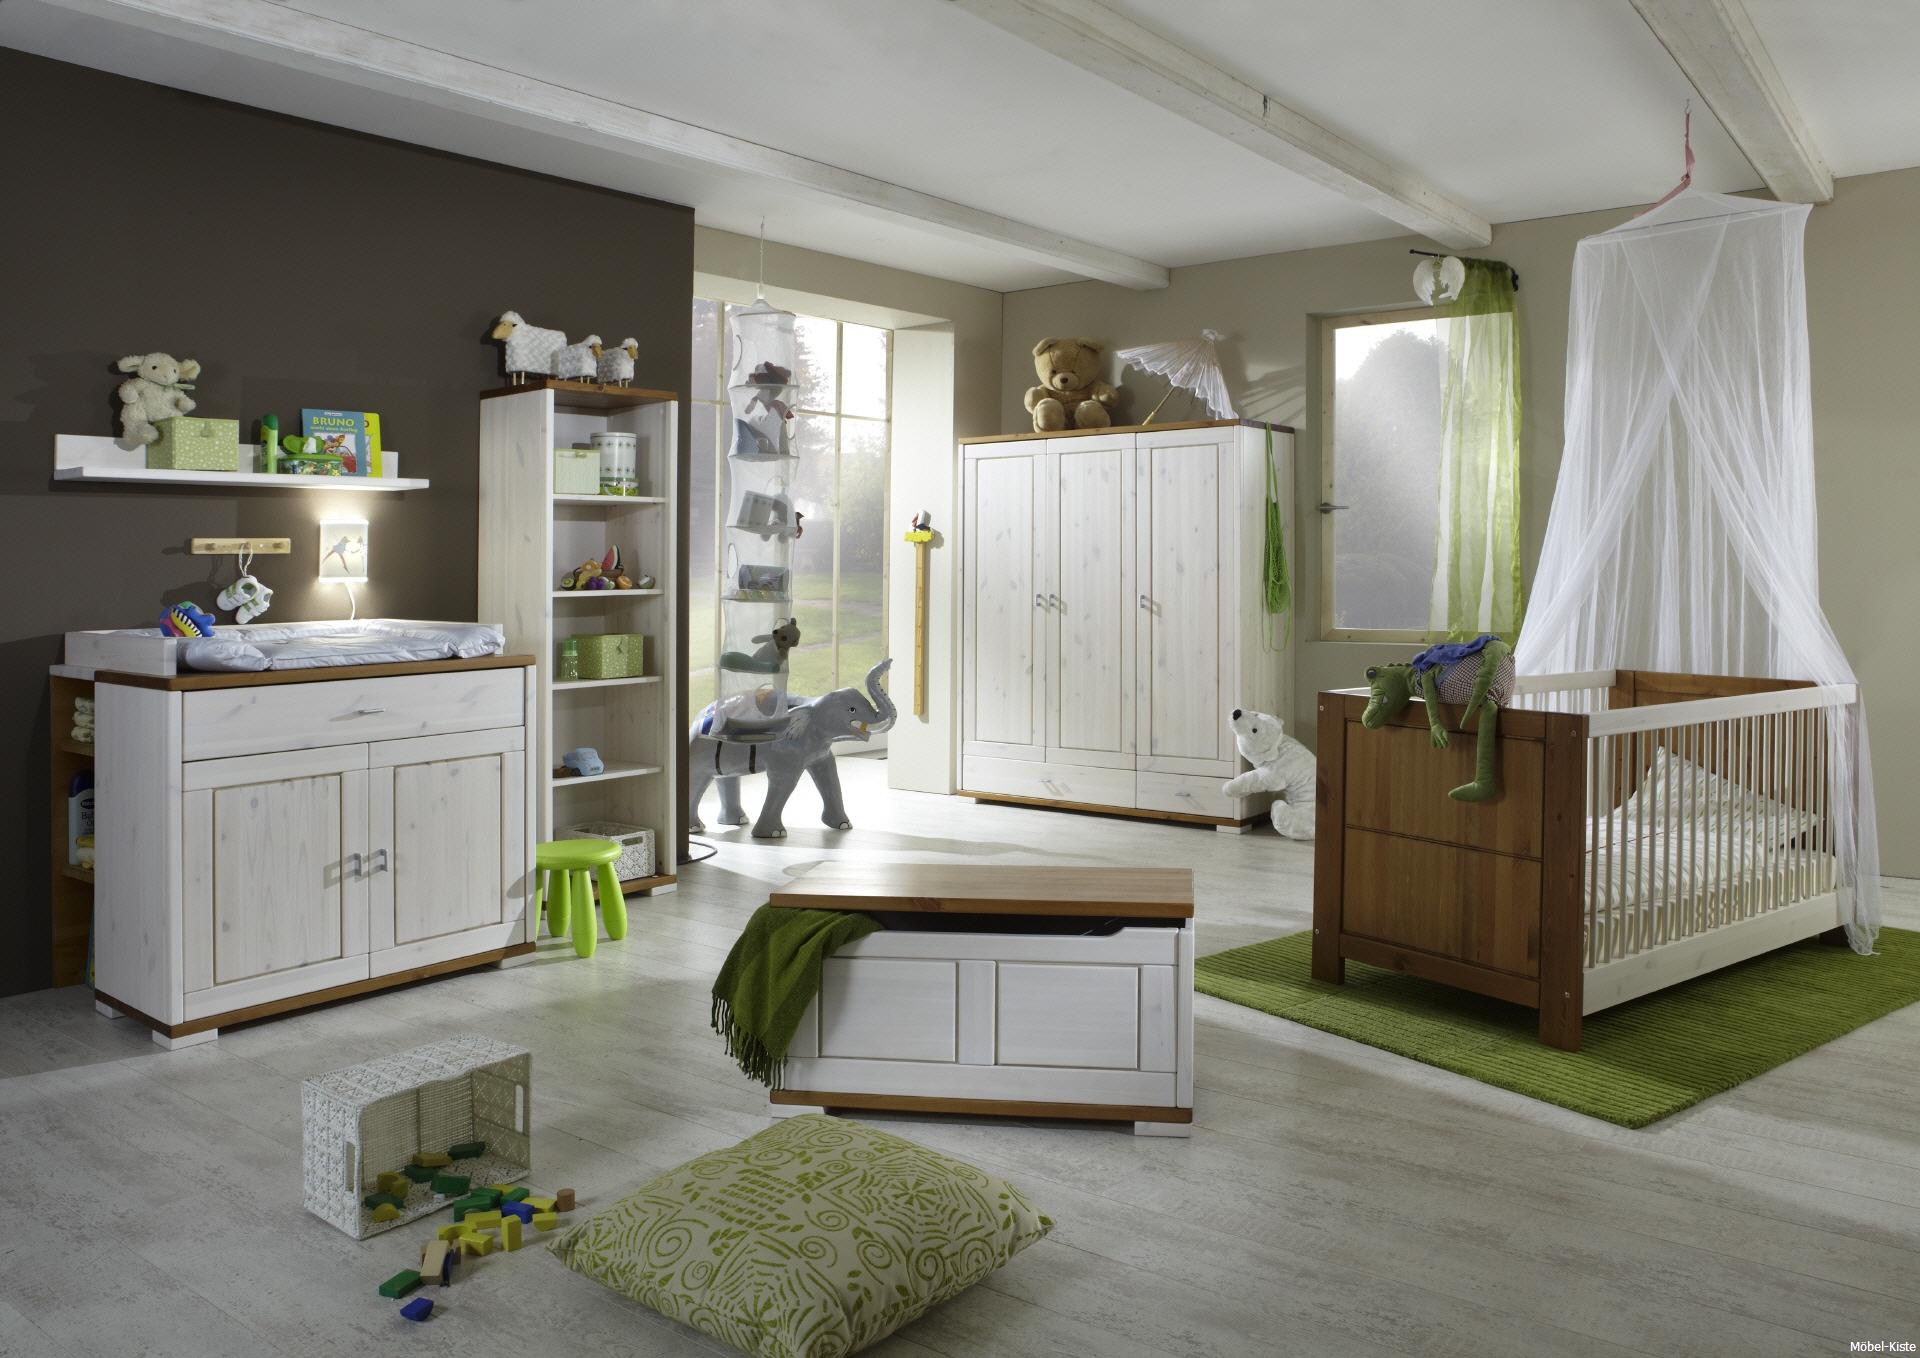 kinder-betten & möbel, Moderne deko